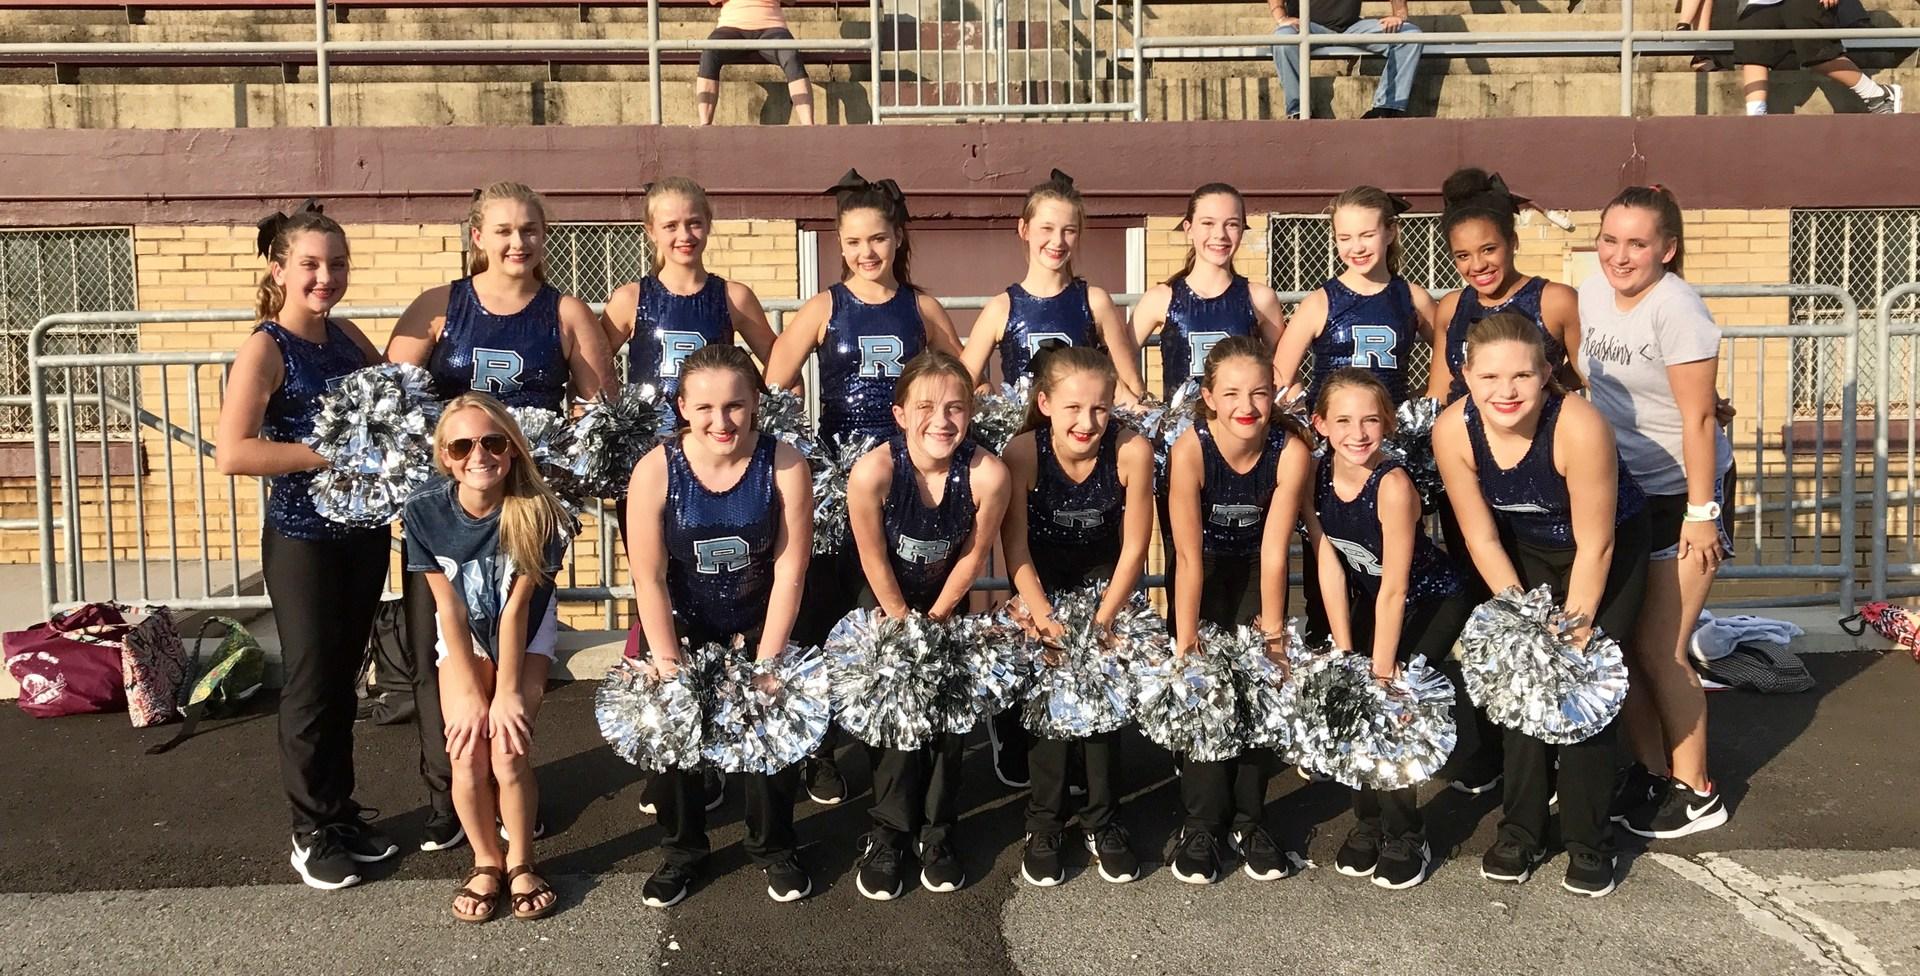 Tags Dance Teams New Members: Kingsport City Schools Athletics